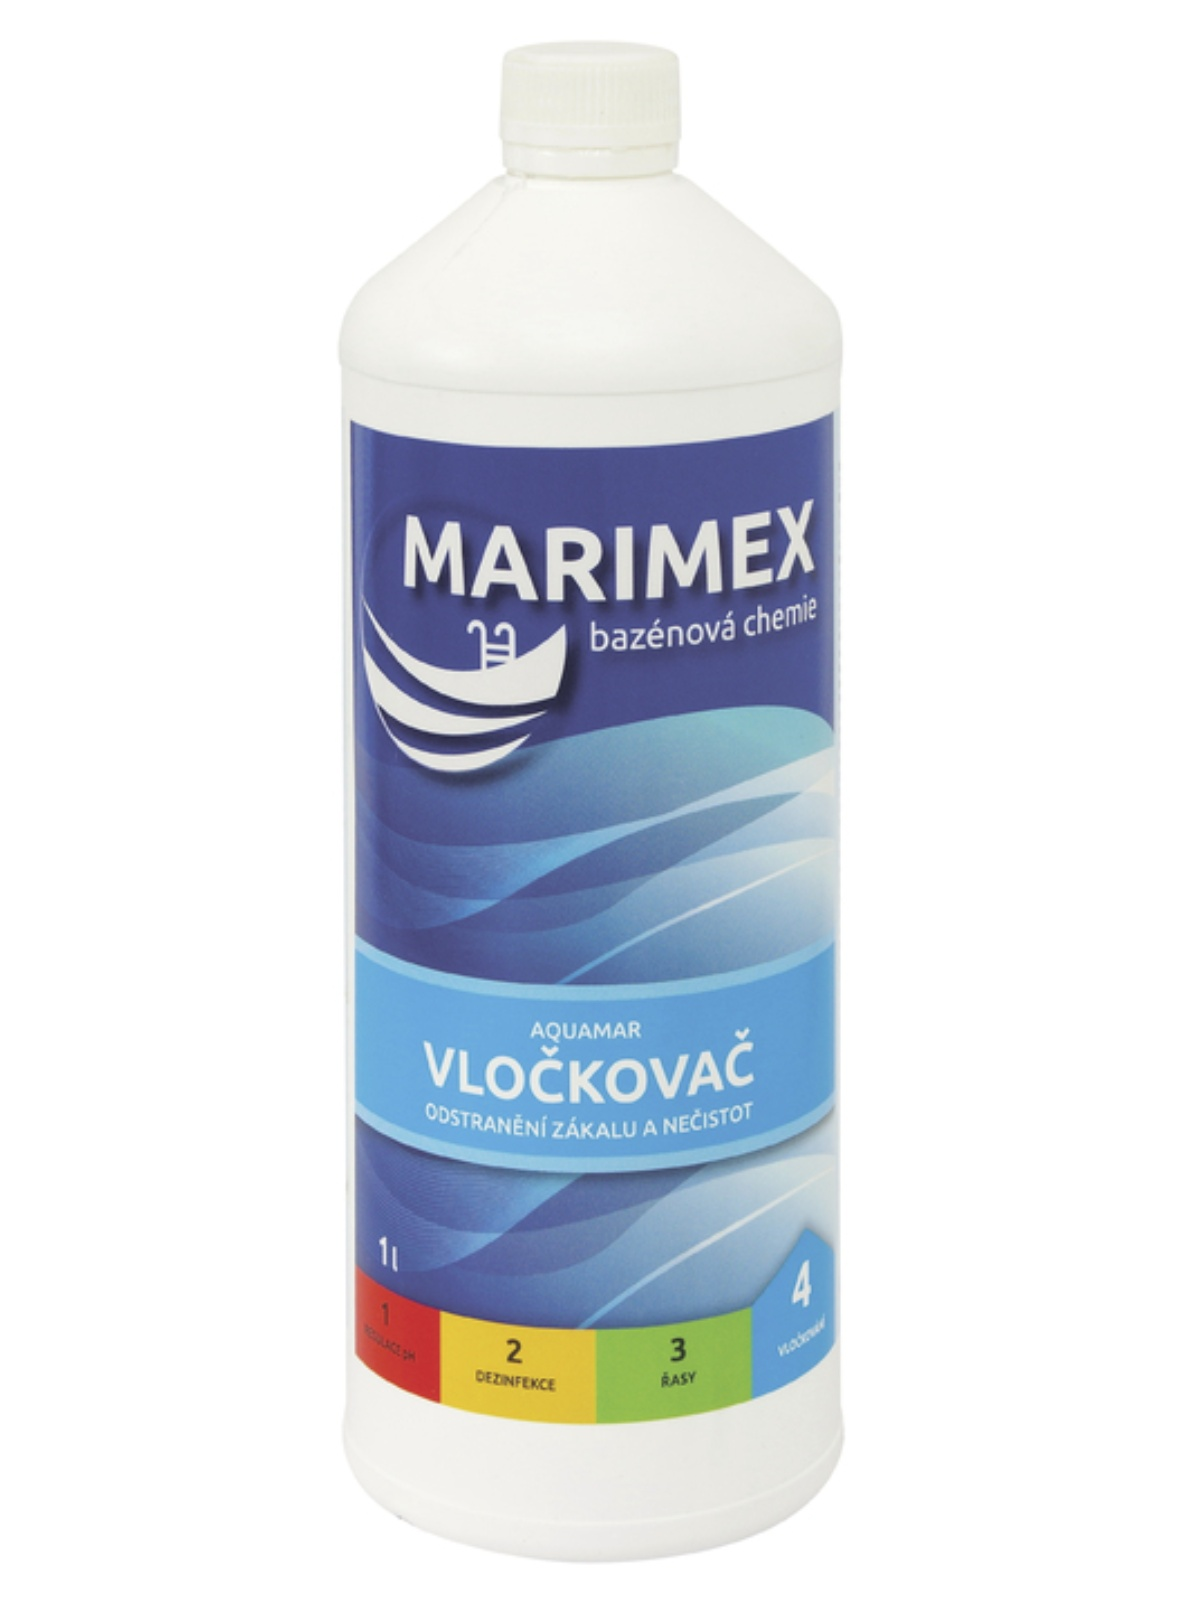 MARIMEX 11302004 Aquamar Vločkovač 1l